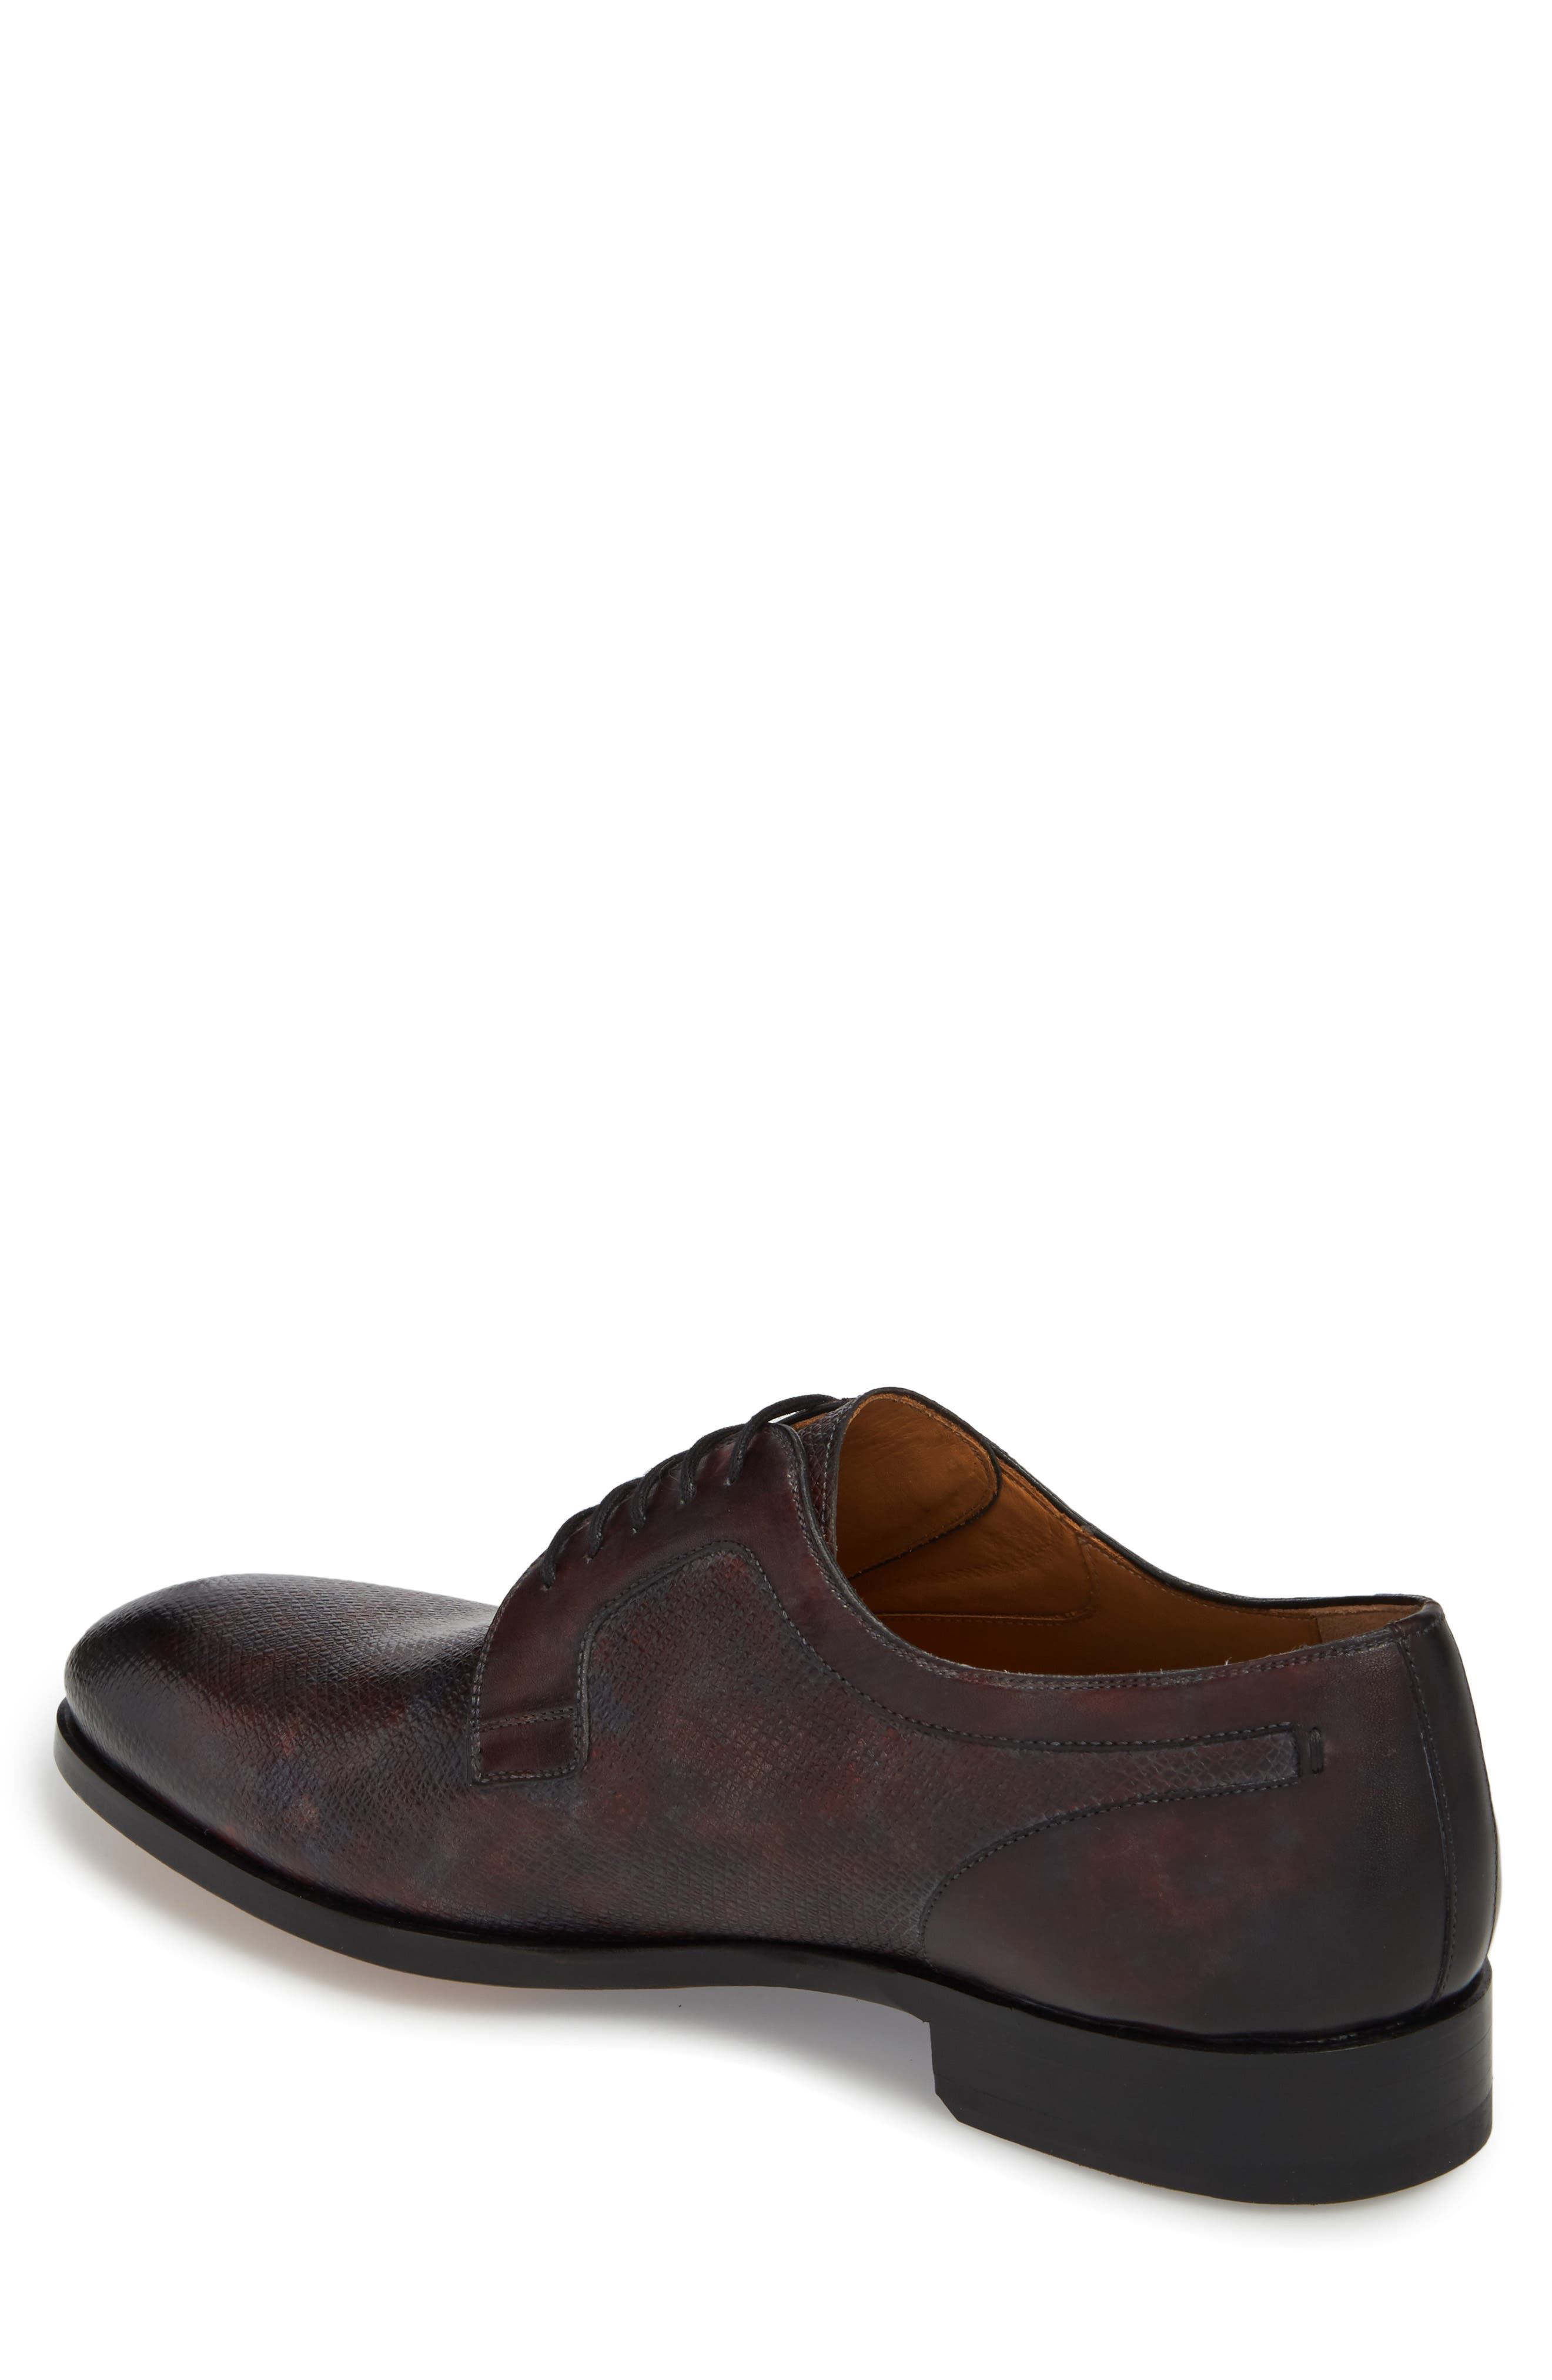 Porter Textured Plain Toe Derby,                             Alternate thumbnail 2, color,                             020